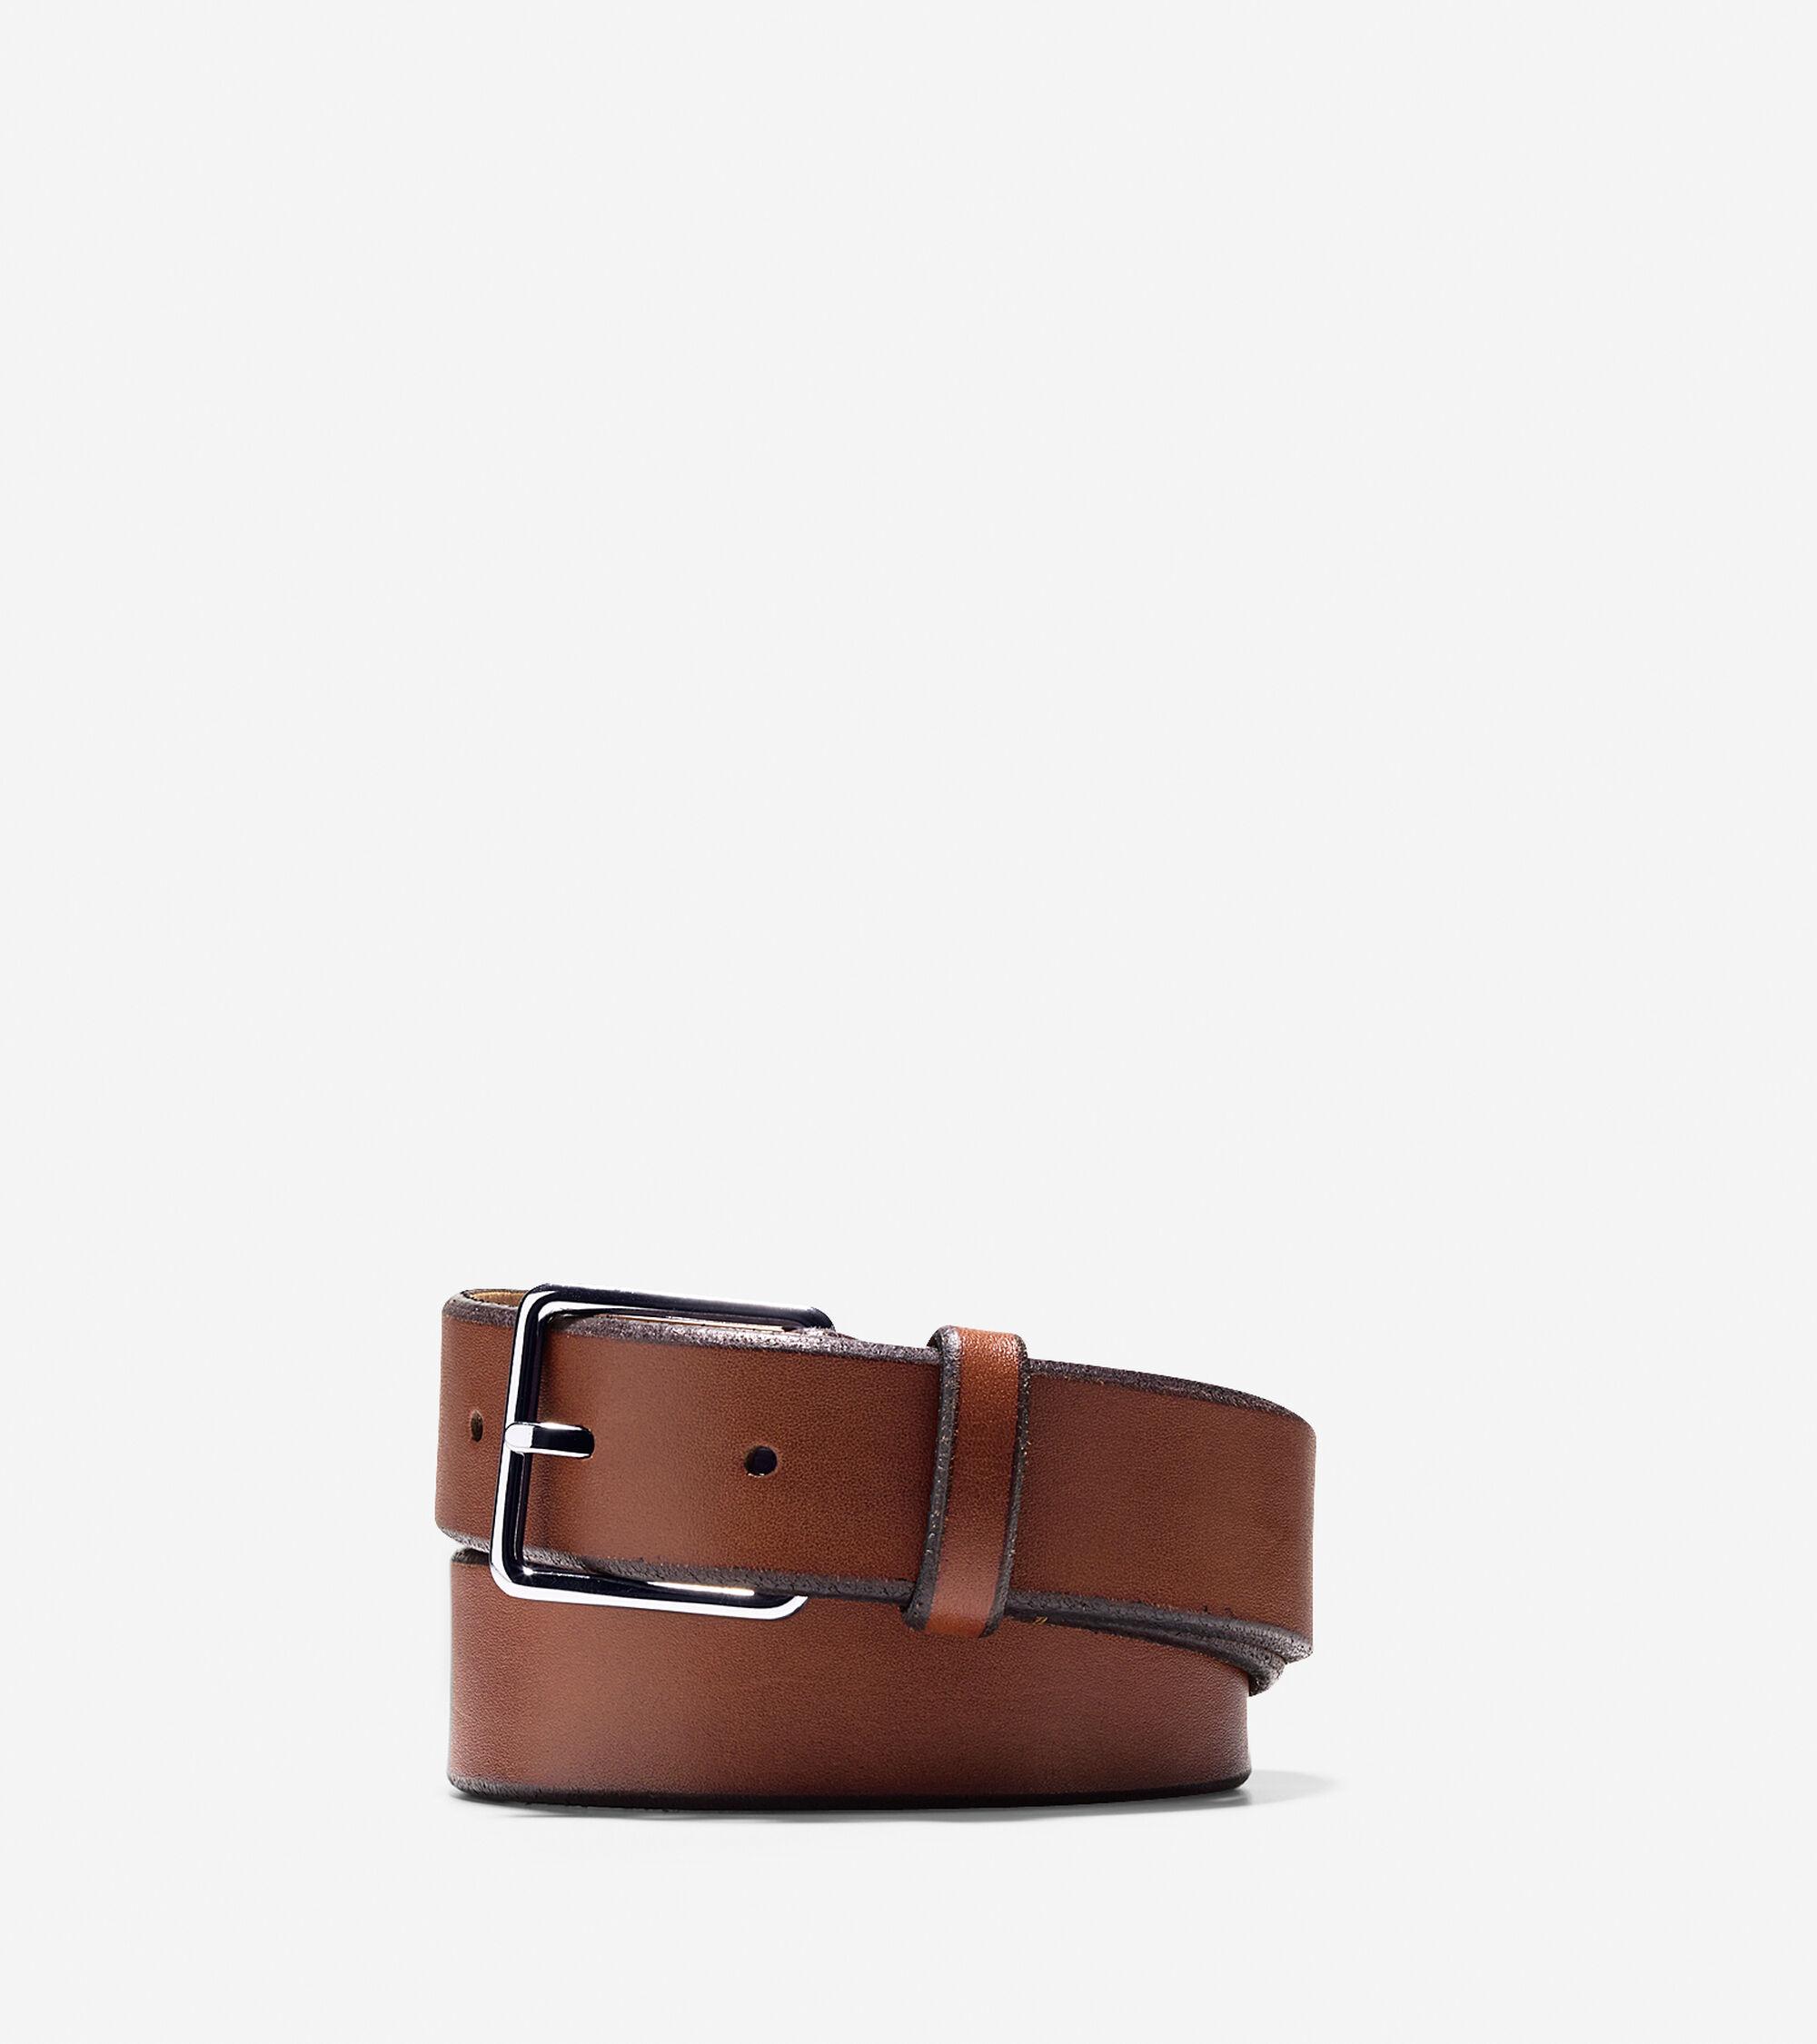 Accessories > 32mm Dress Leather Belt